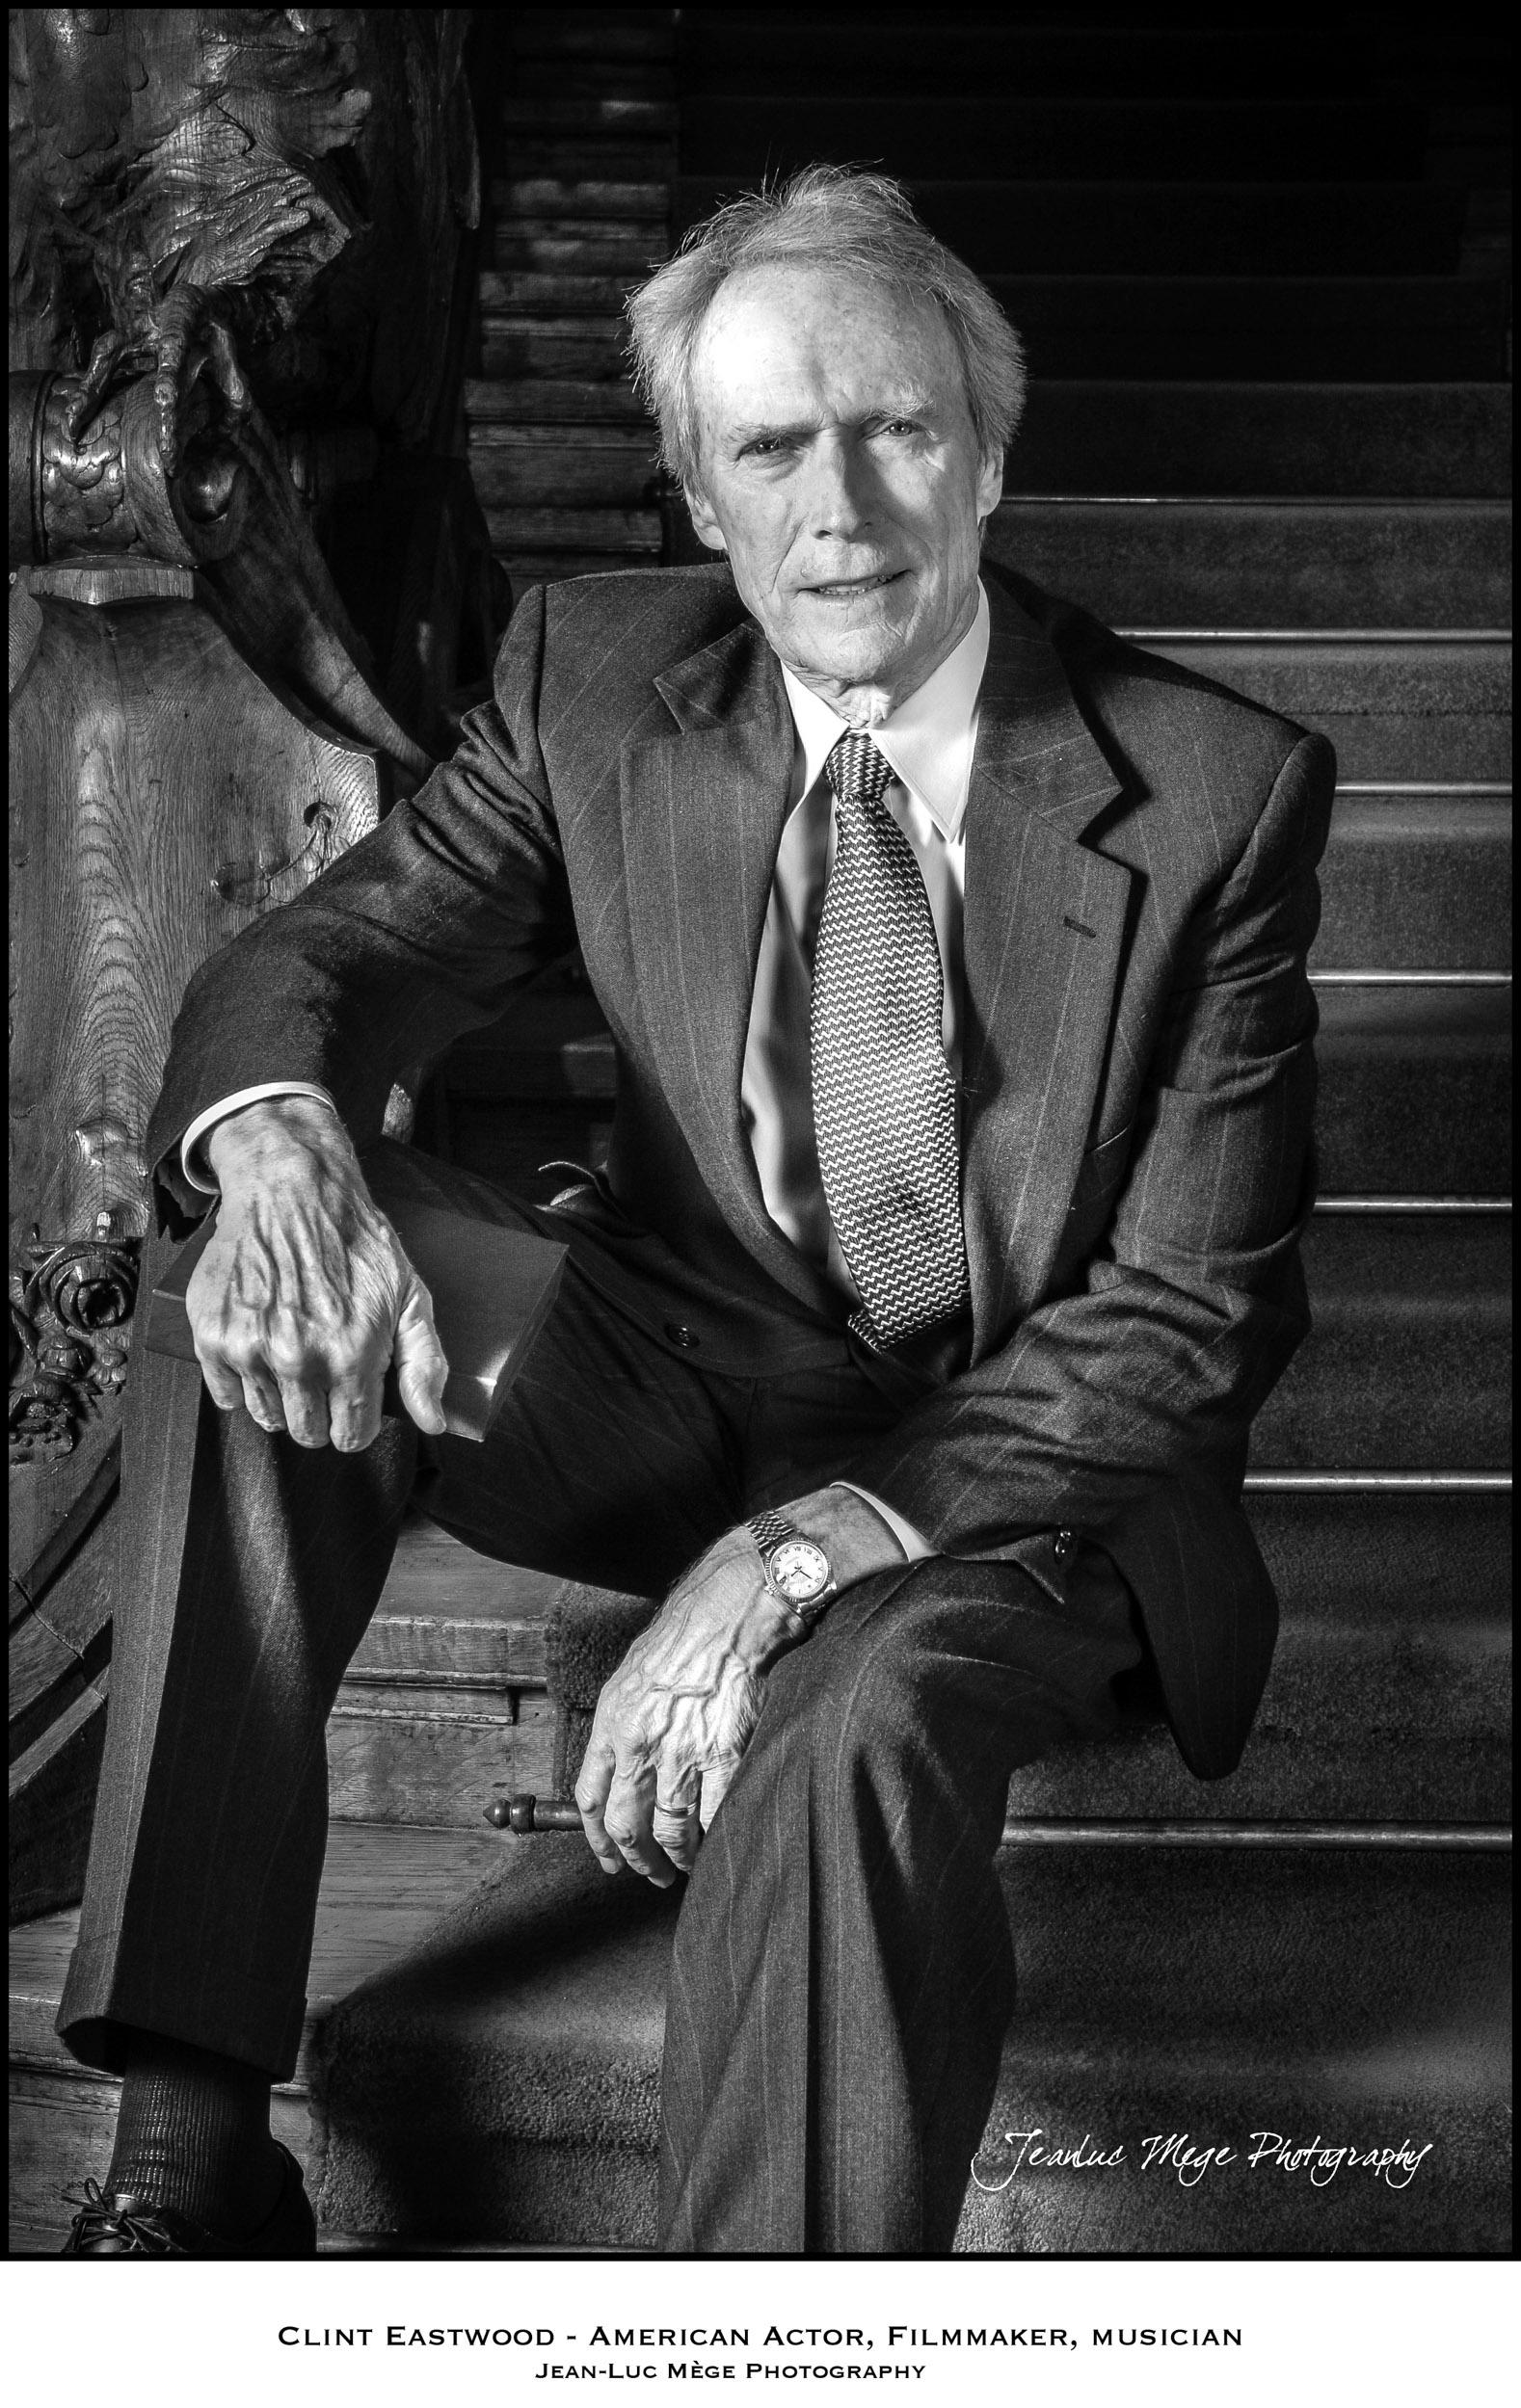 Clint Eastwood 2016 oktitre@jeanlucmege-4301.jpg